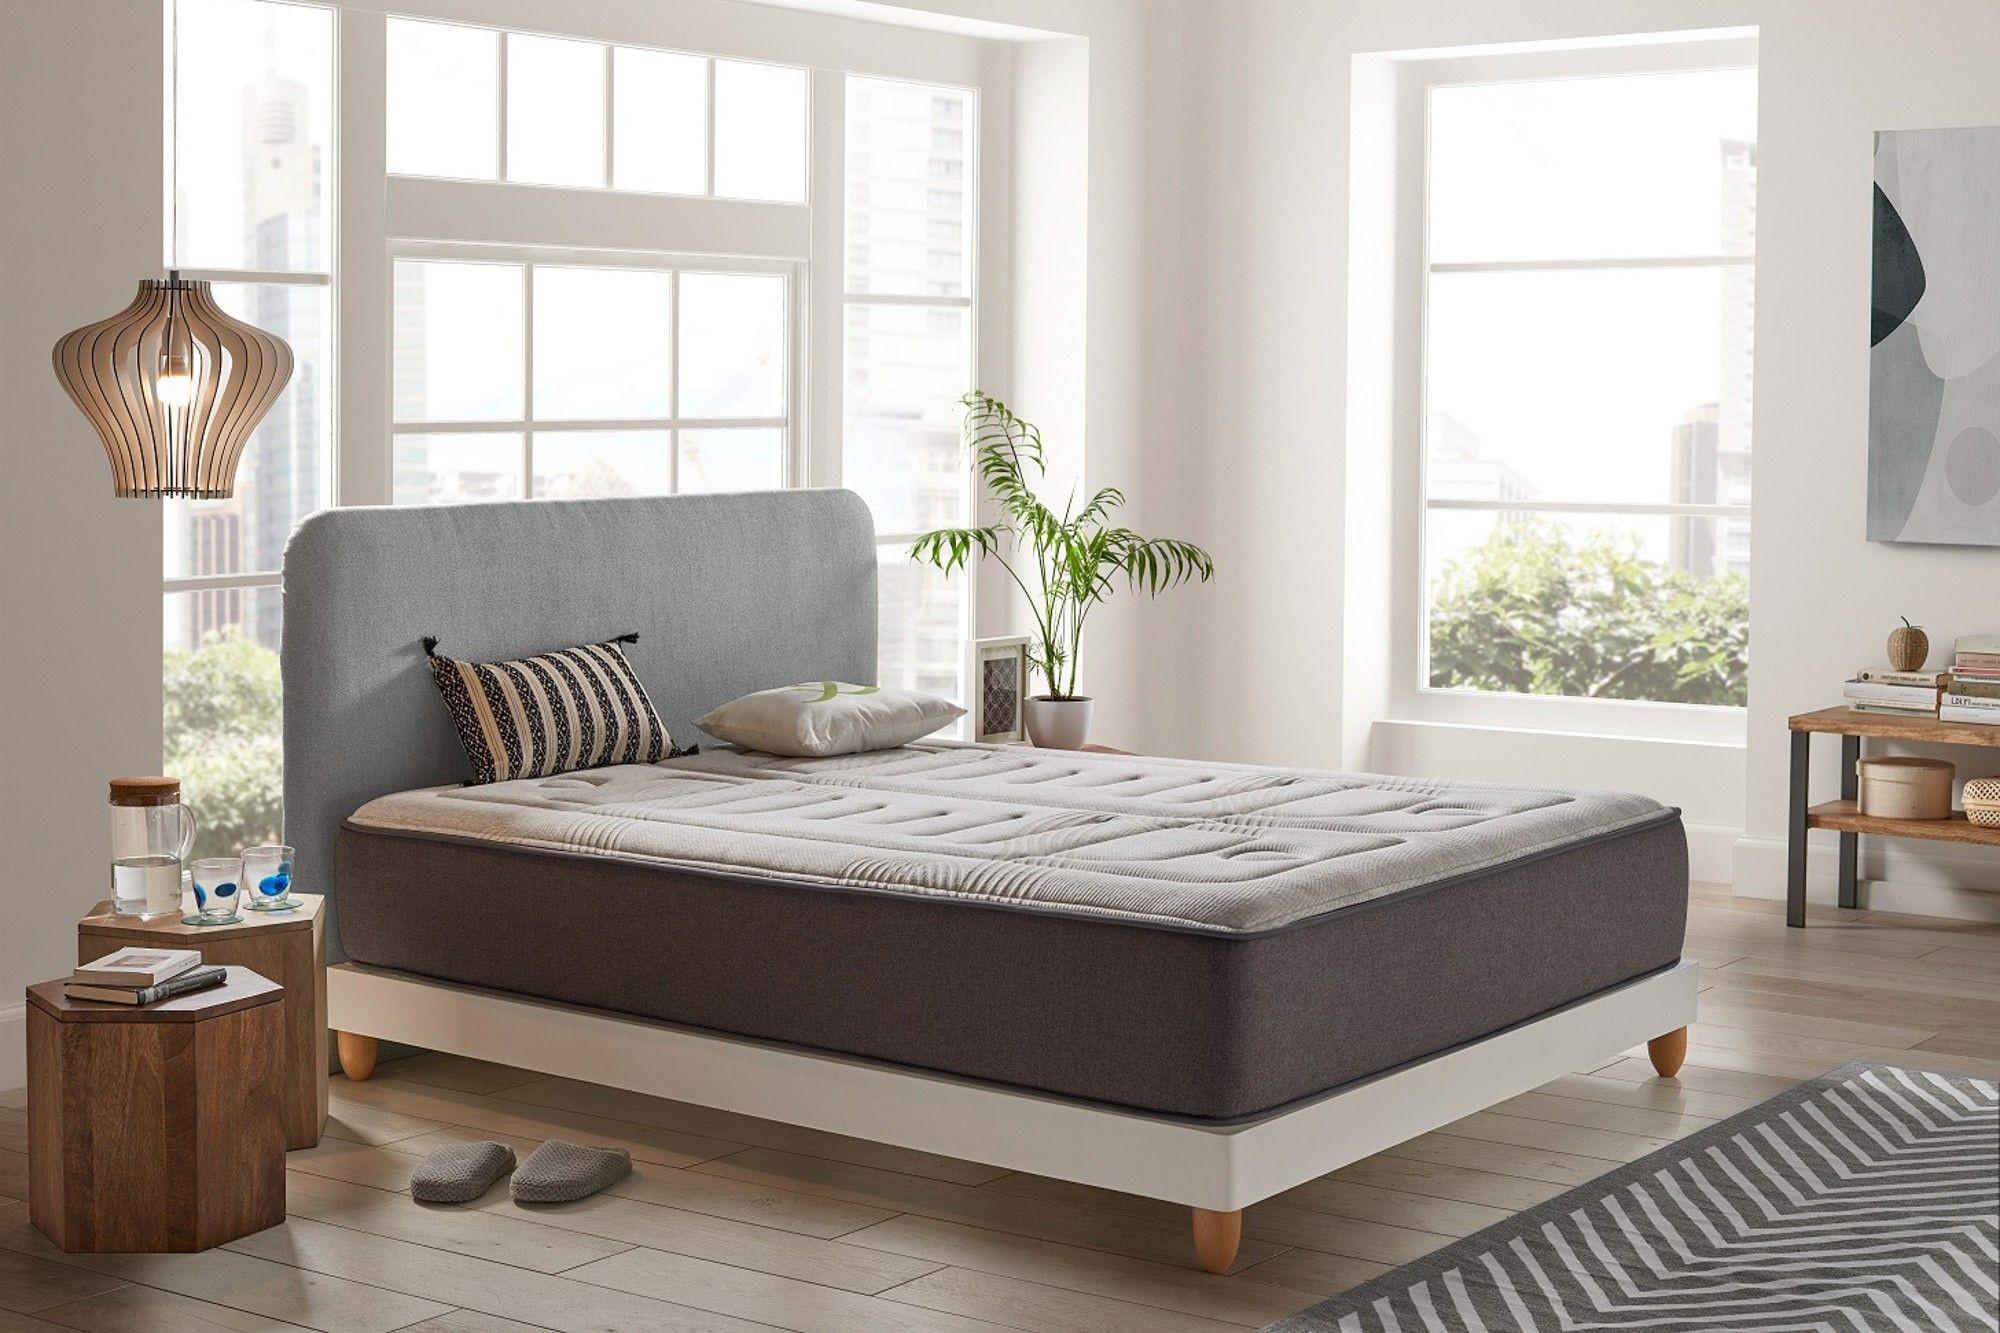 Colchón visco JUPITER de alta gama - 30 cm | Cosmos® Bedding